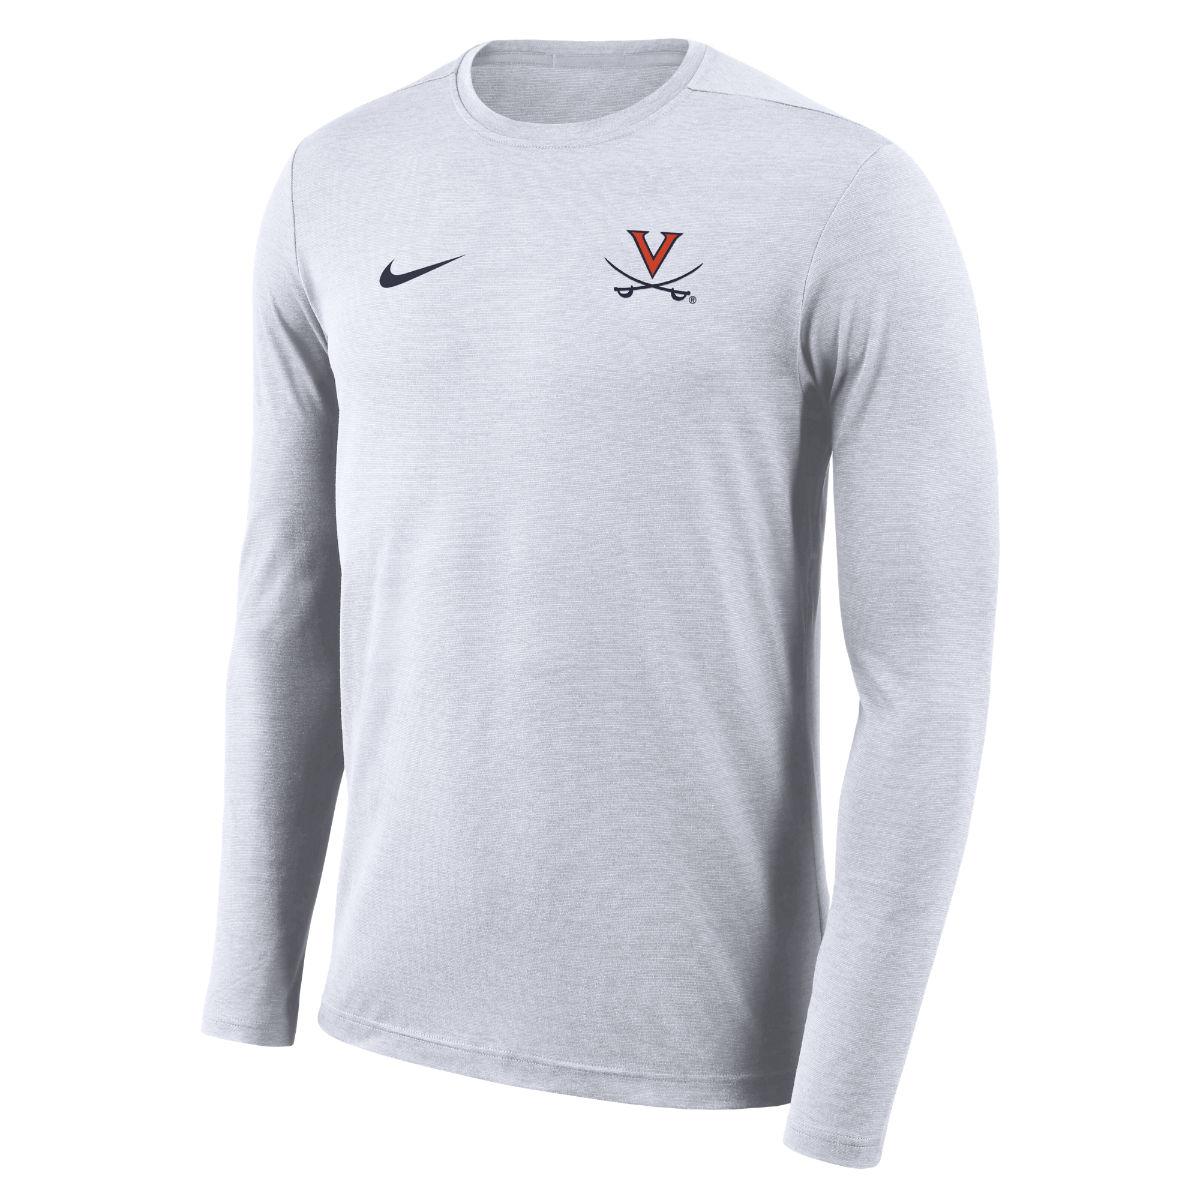 University of Virginia Coach NIKE LS T-shirt